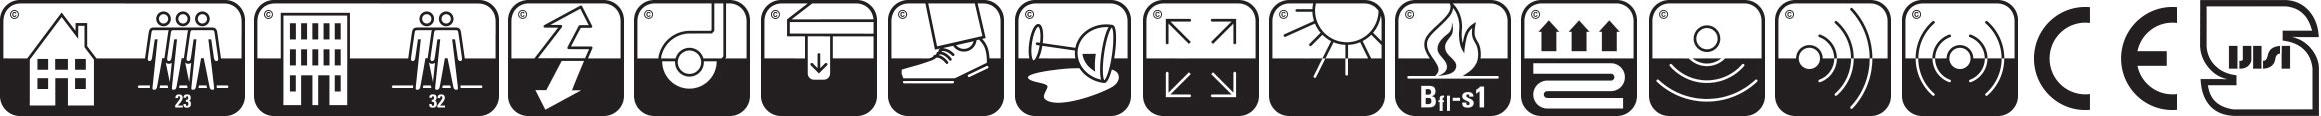 Arta Luxury Vinyl Plank LVP Certificates